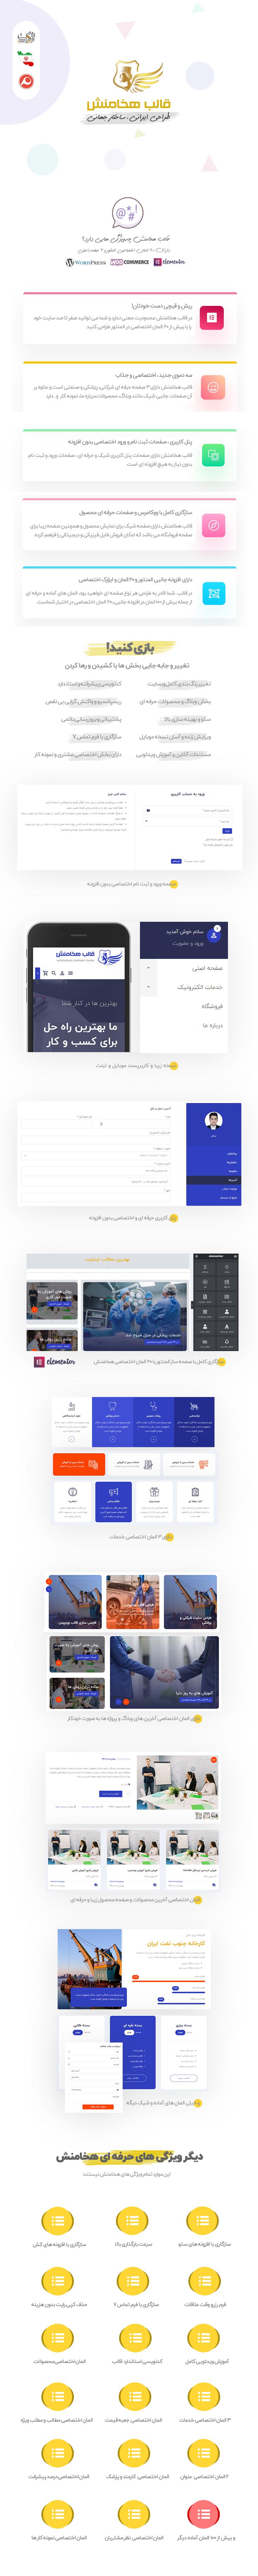 file hakhamanesh - قالب شرکتی وردپرس هخامنش | قالب ایرانی پزشکی و صنعتی چندمنظوره